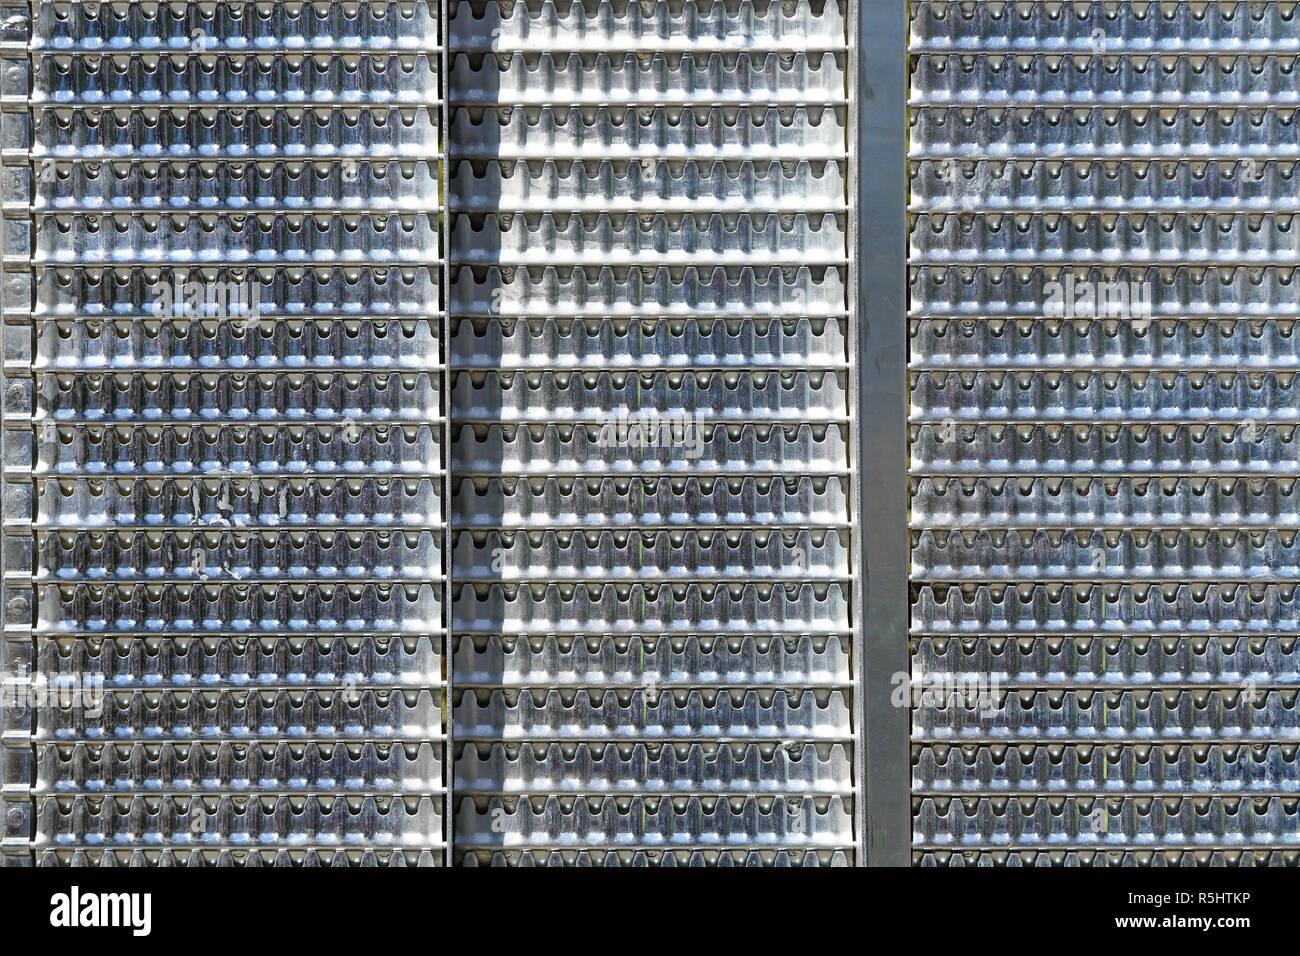 Metal Farm Flooring - Stock Image